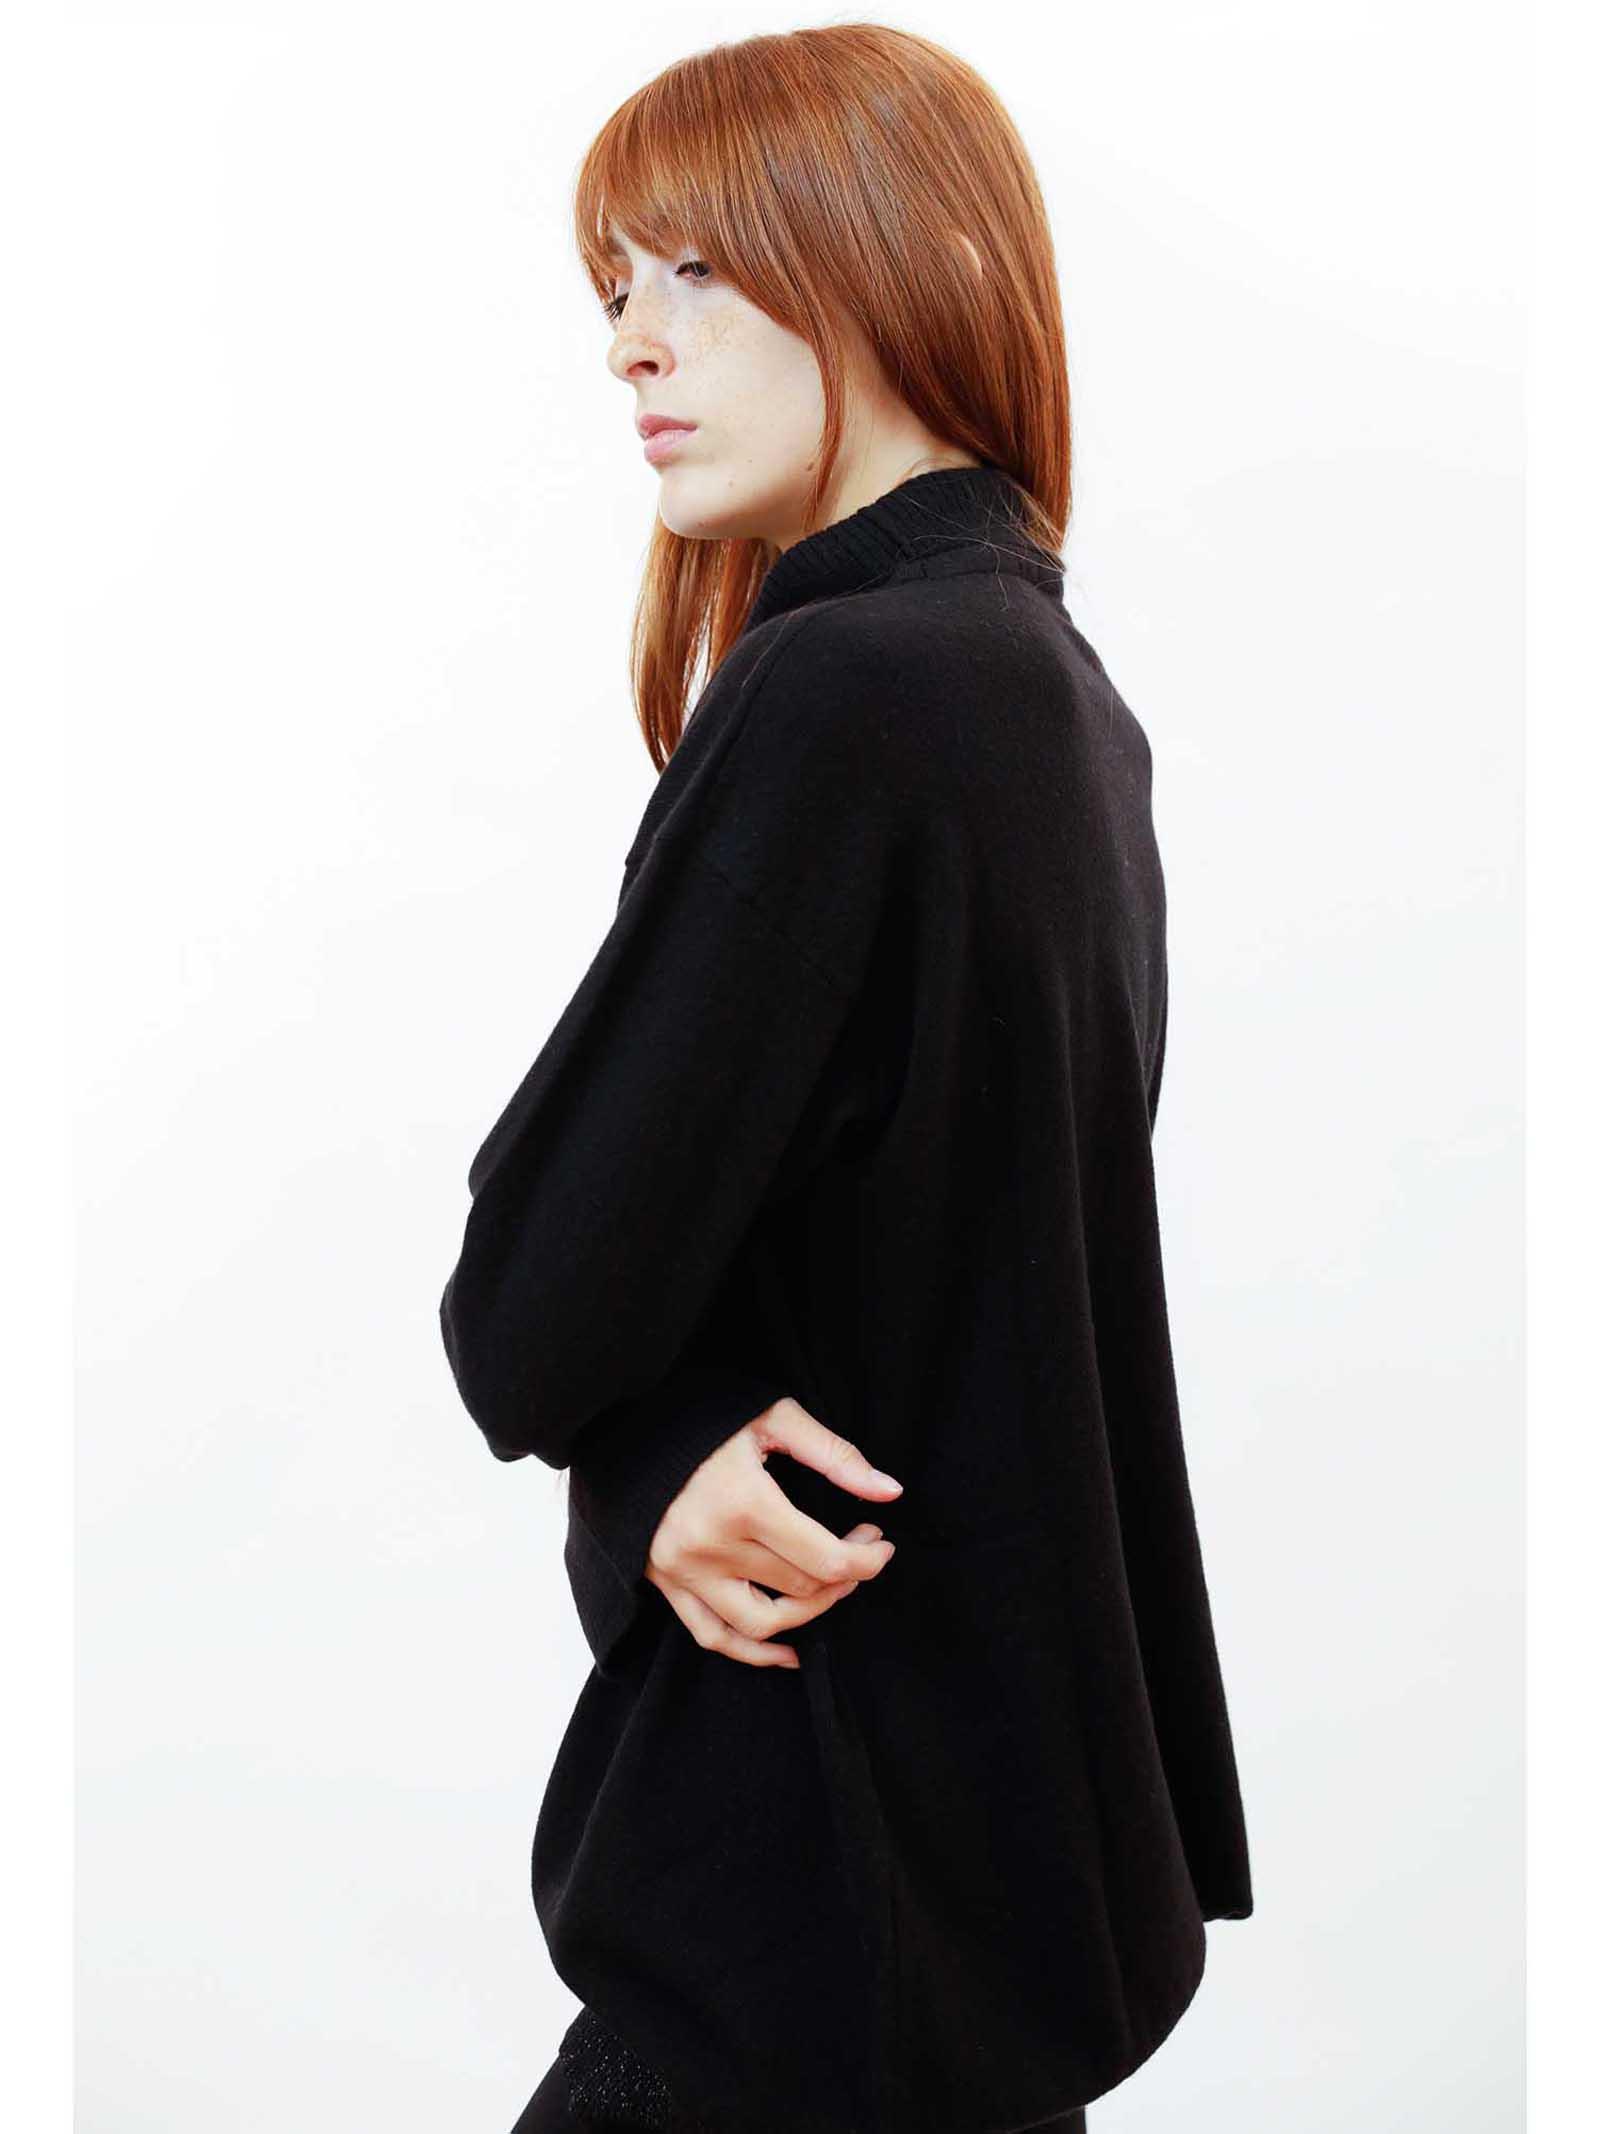 Women's Clothing Soft Cashmere Sweater in Black and Luerx Turtleneck Maliparmi | Knitwear | JQ49027052320000